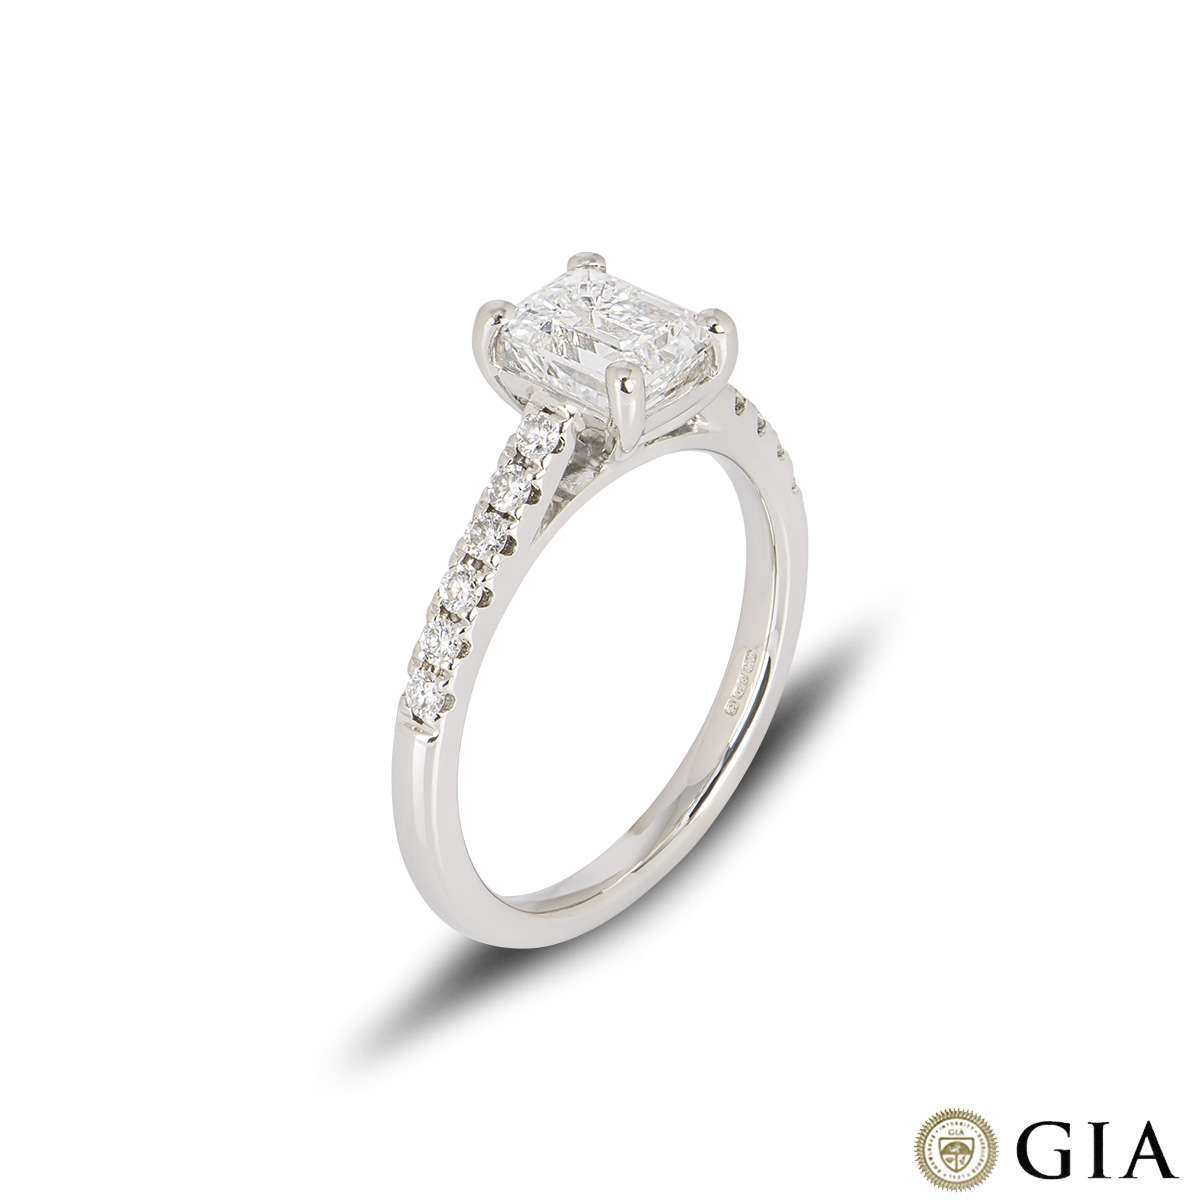 Platinum Emerald Cut Diamond Ring 1.28ct F/VS1